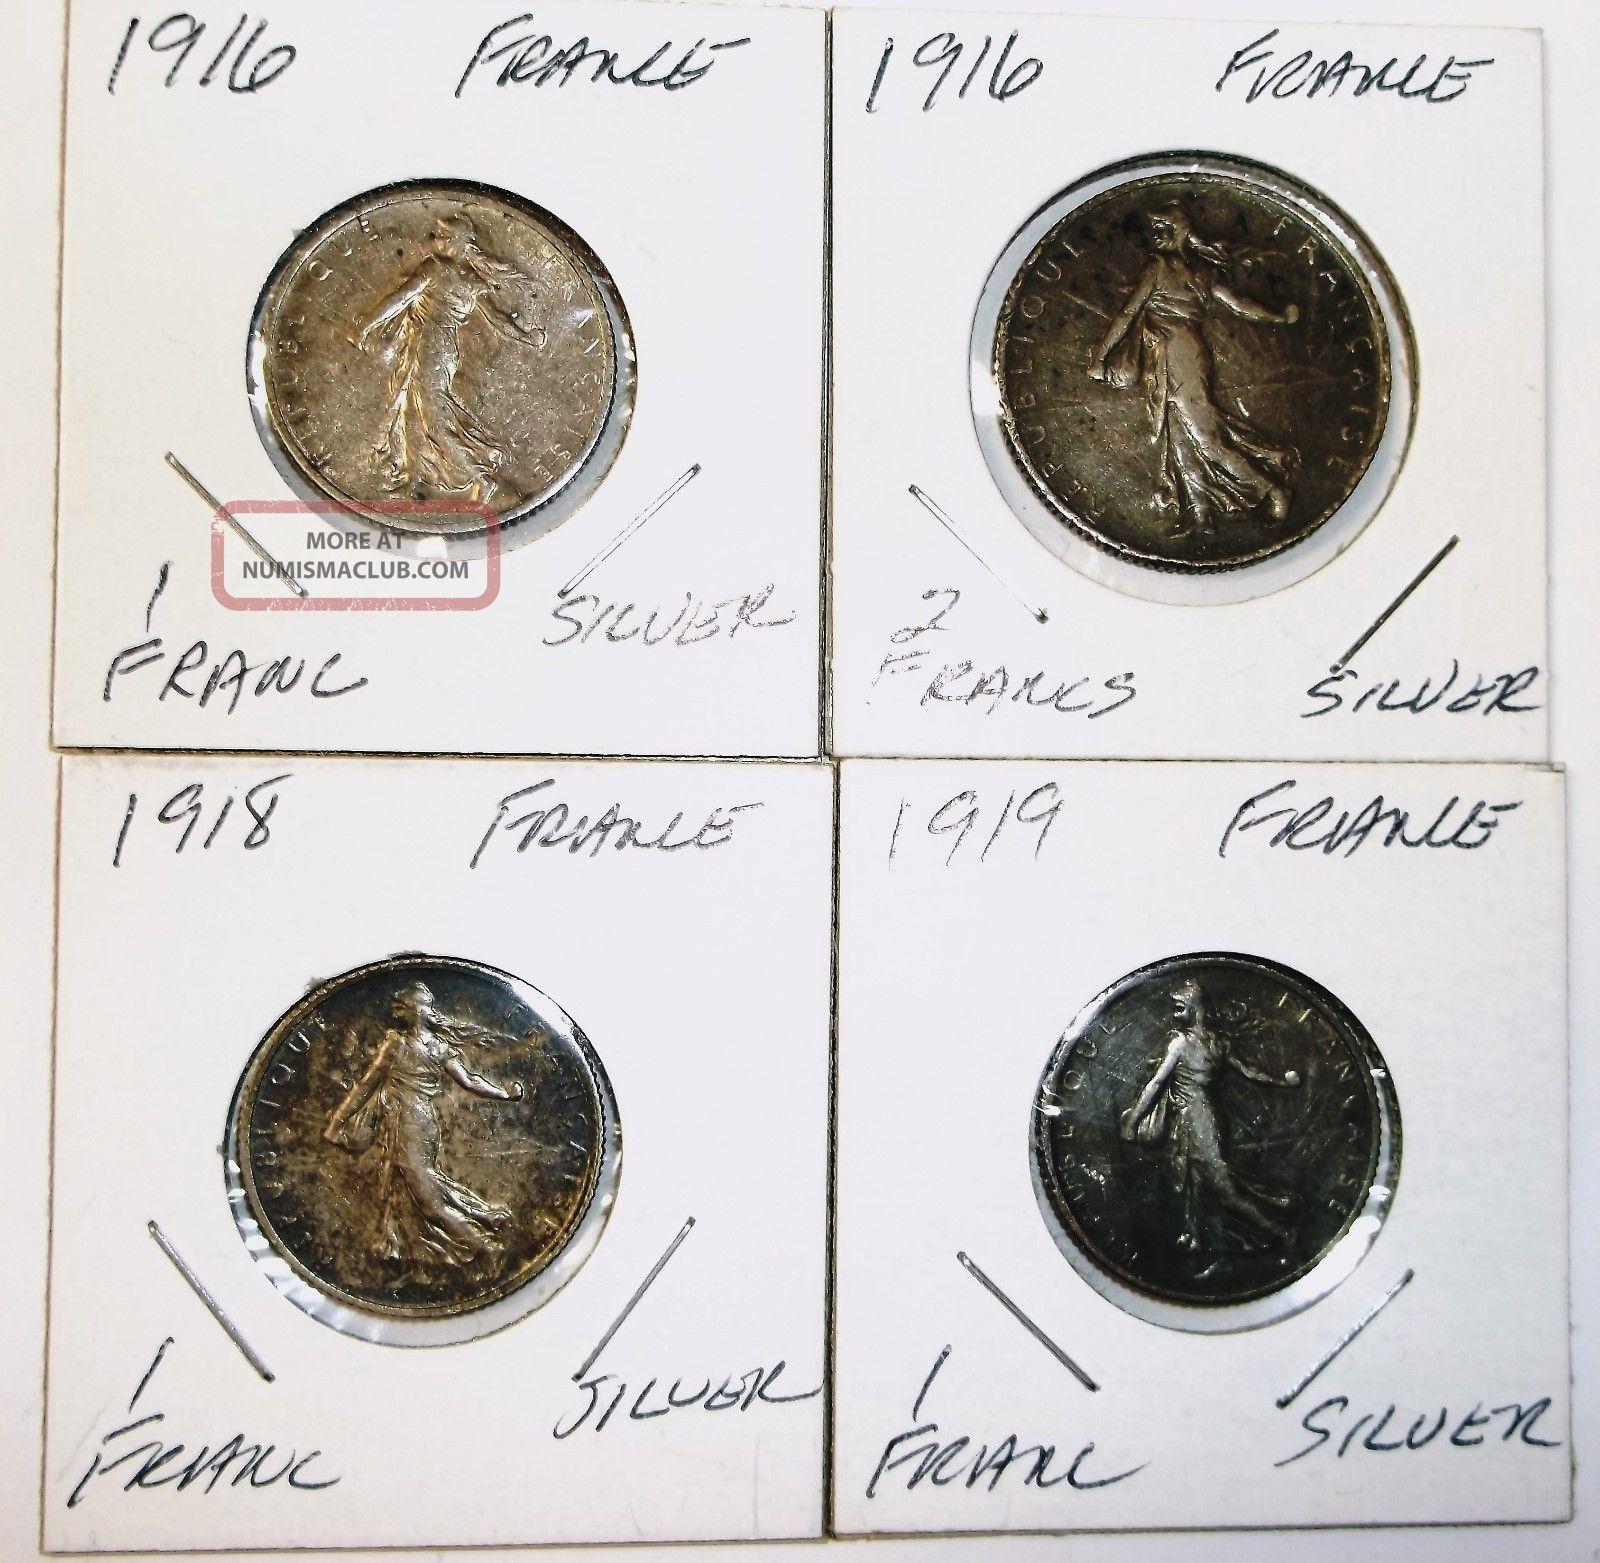 1916 1 - Franc,  1916 2 Francs,  1918 1 Franc,  1919 1 Franc - France -.  835 Silver - 4 - Europe photo